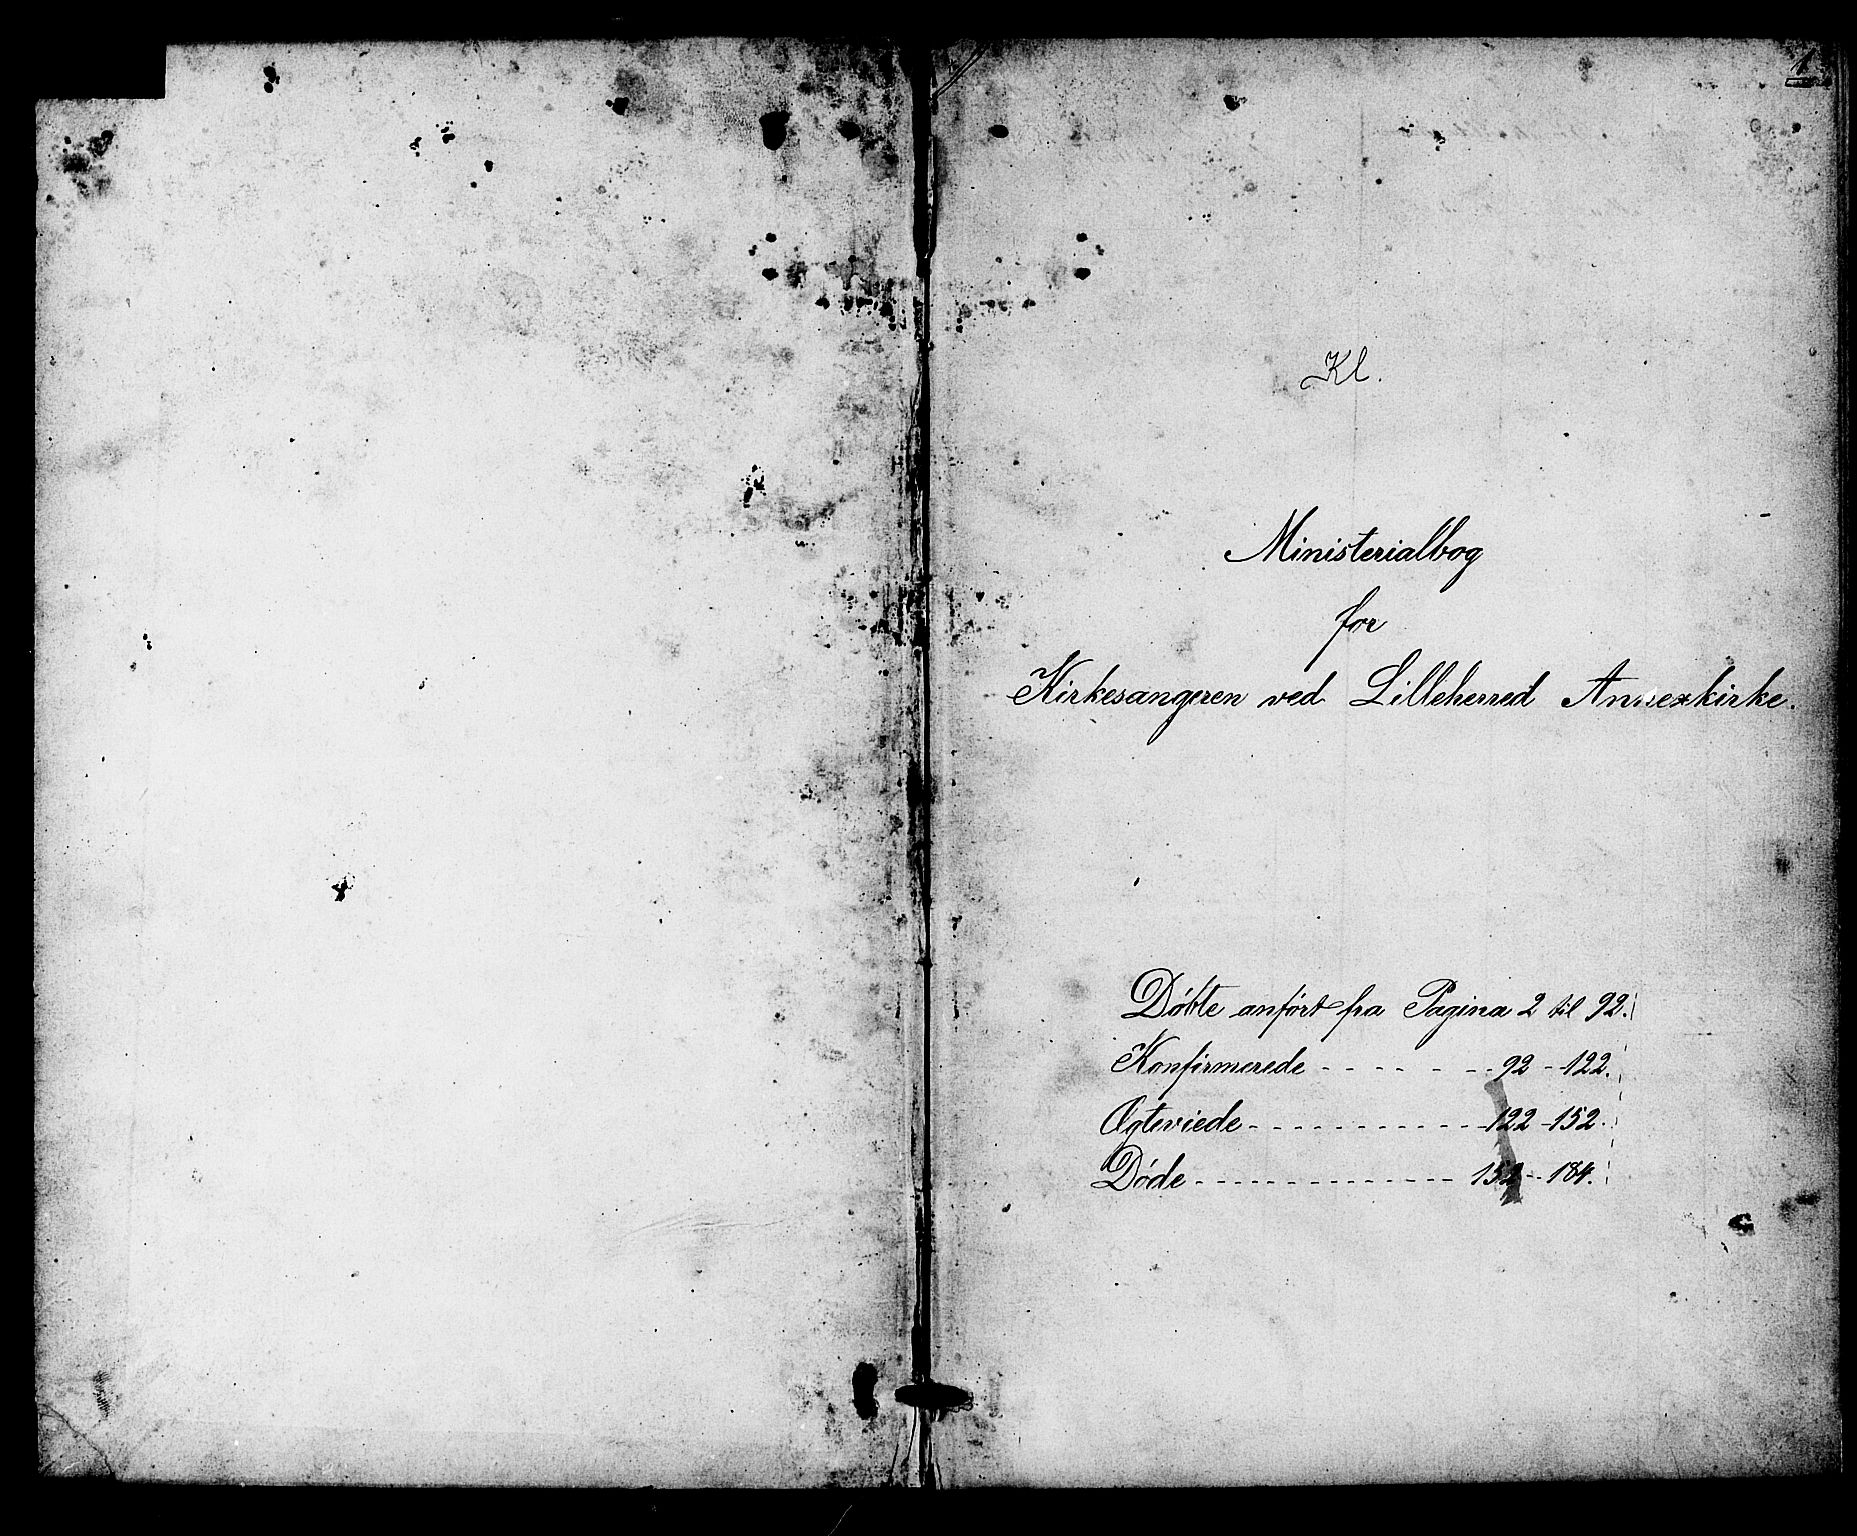 SAKO, Heddal kirkebøker, G/Gb/L0001: Klokkerbok nr. II 1, 1866-1887, s. 0-1